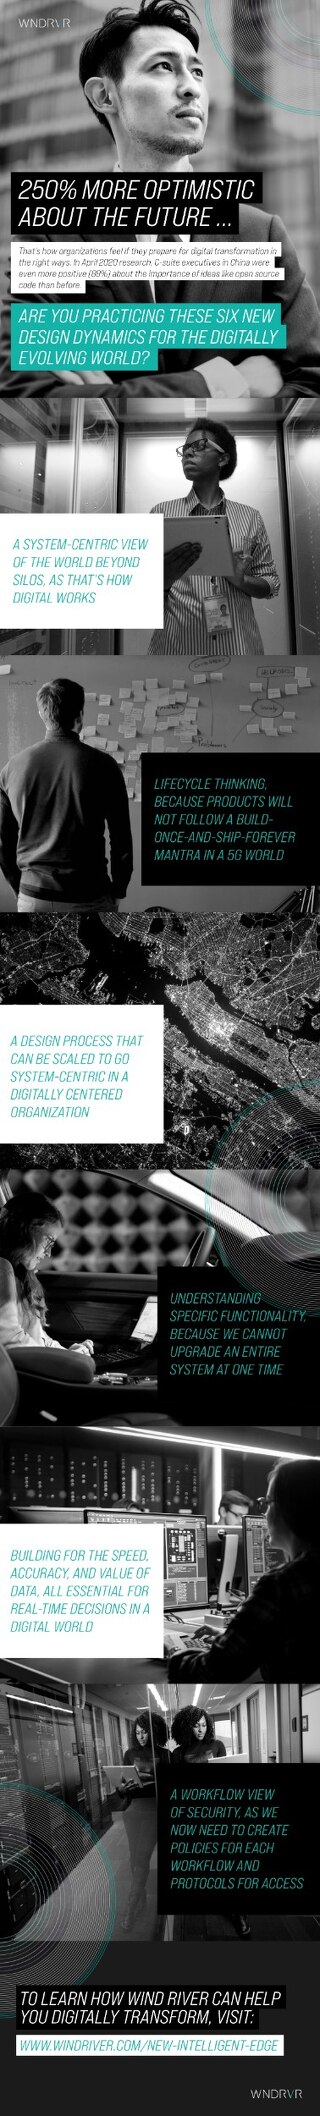 Six New Dynamics for the Digitally Evolving World